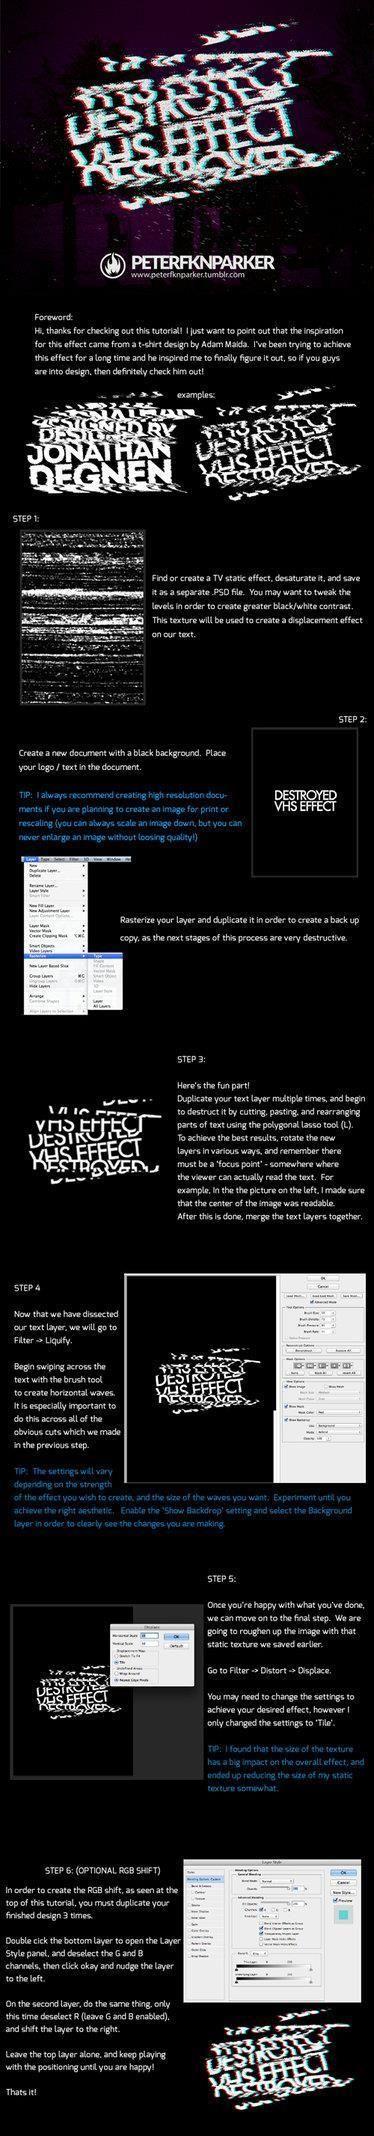 Glitch Photoshop Effect: Tutorials, Textures & Actions